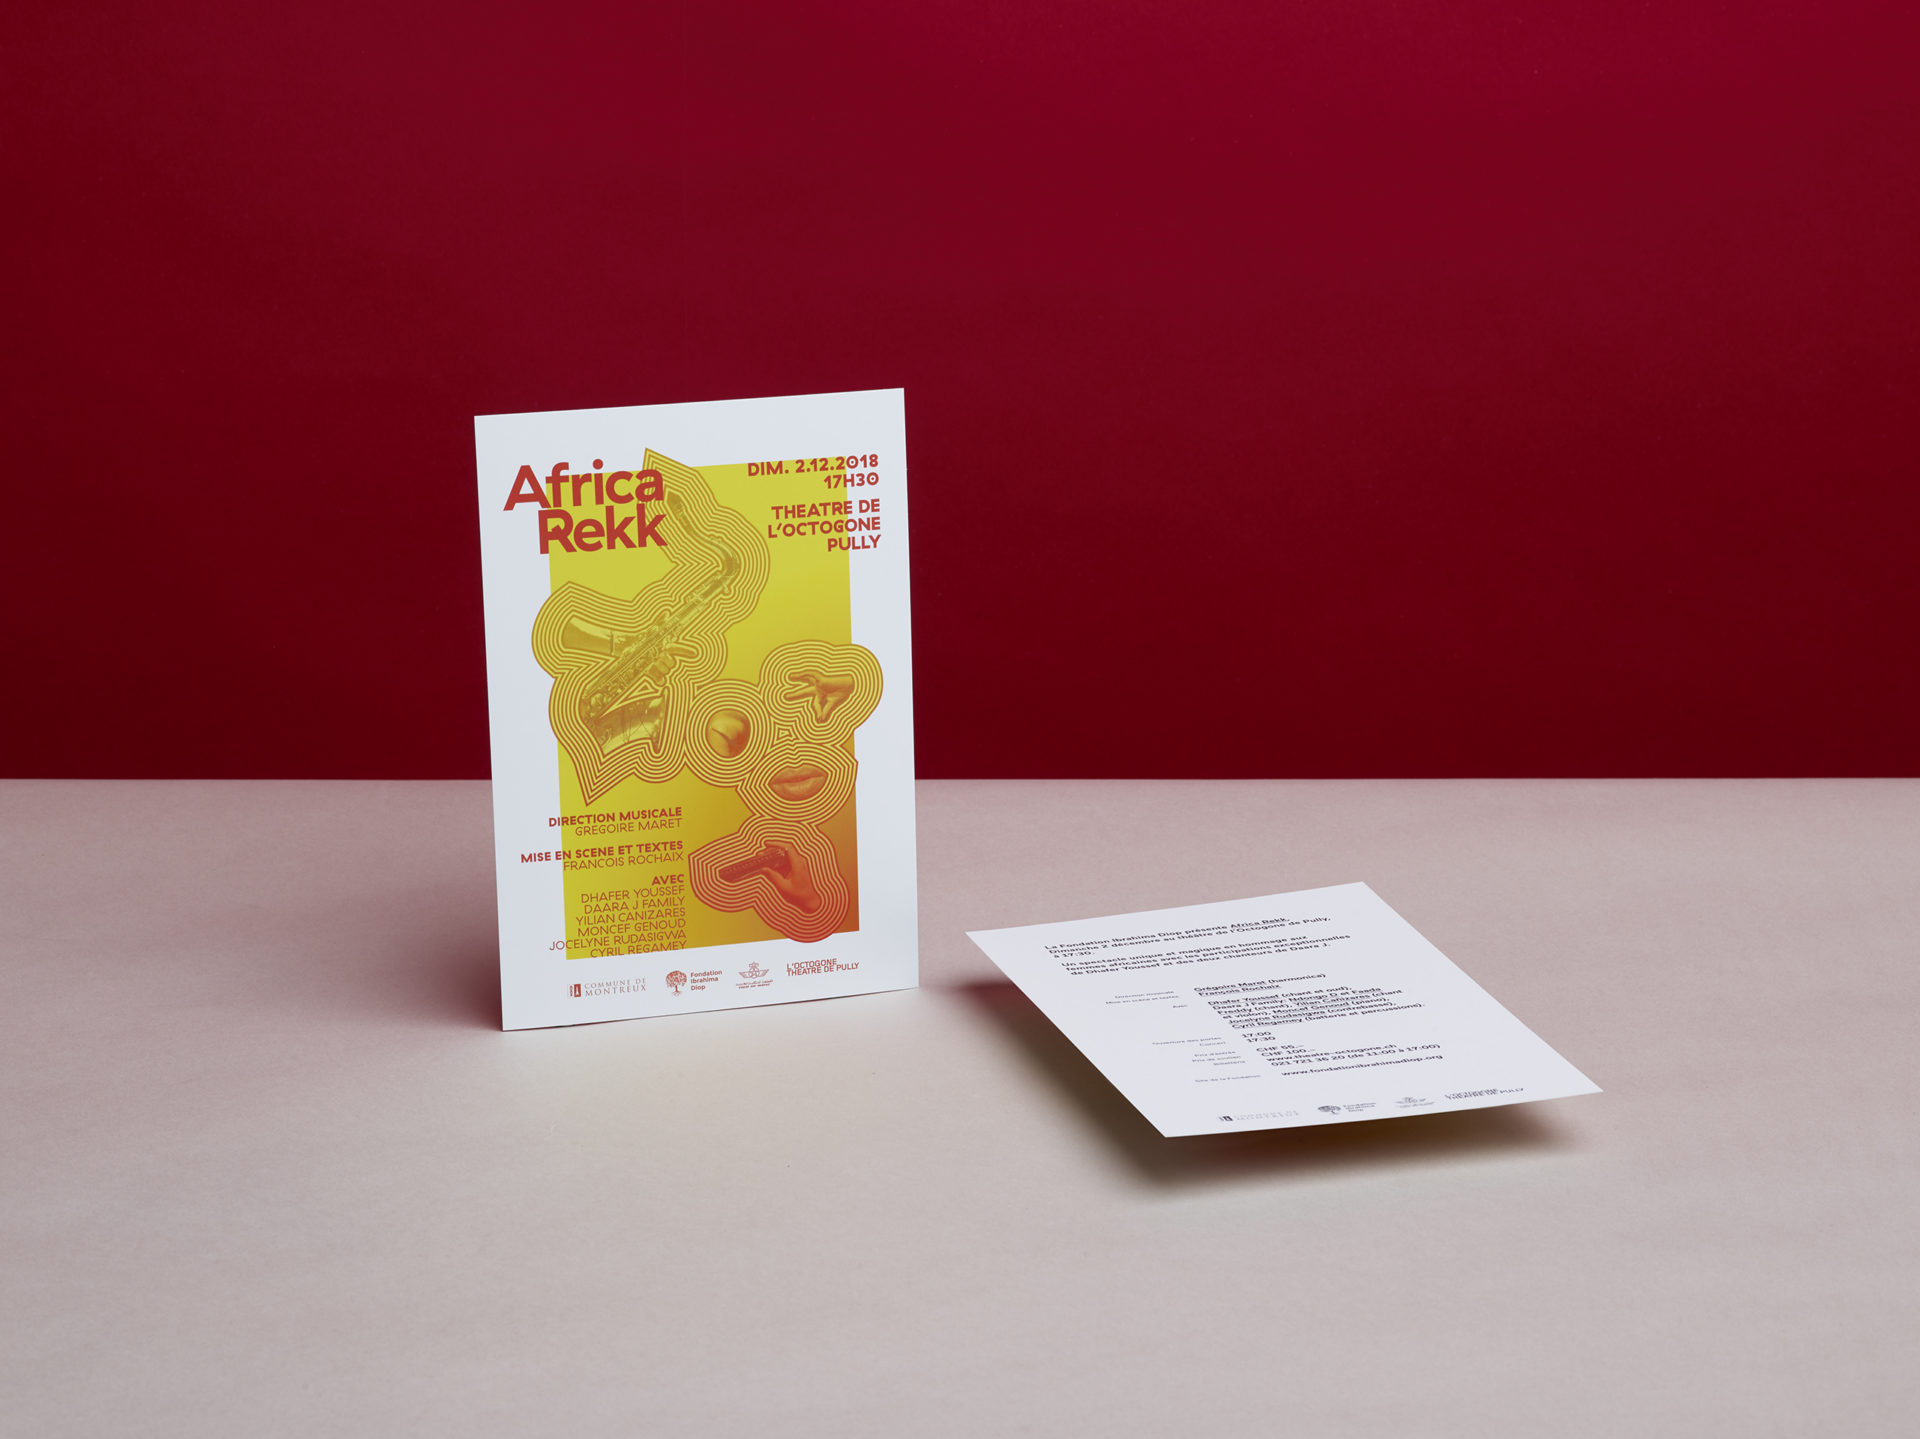 Africa rekk - Avalanche